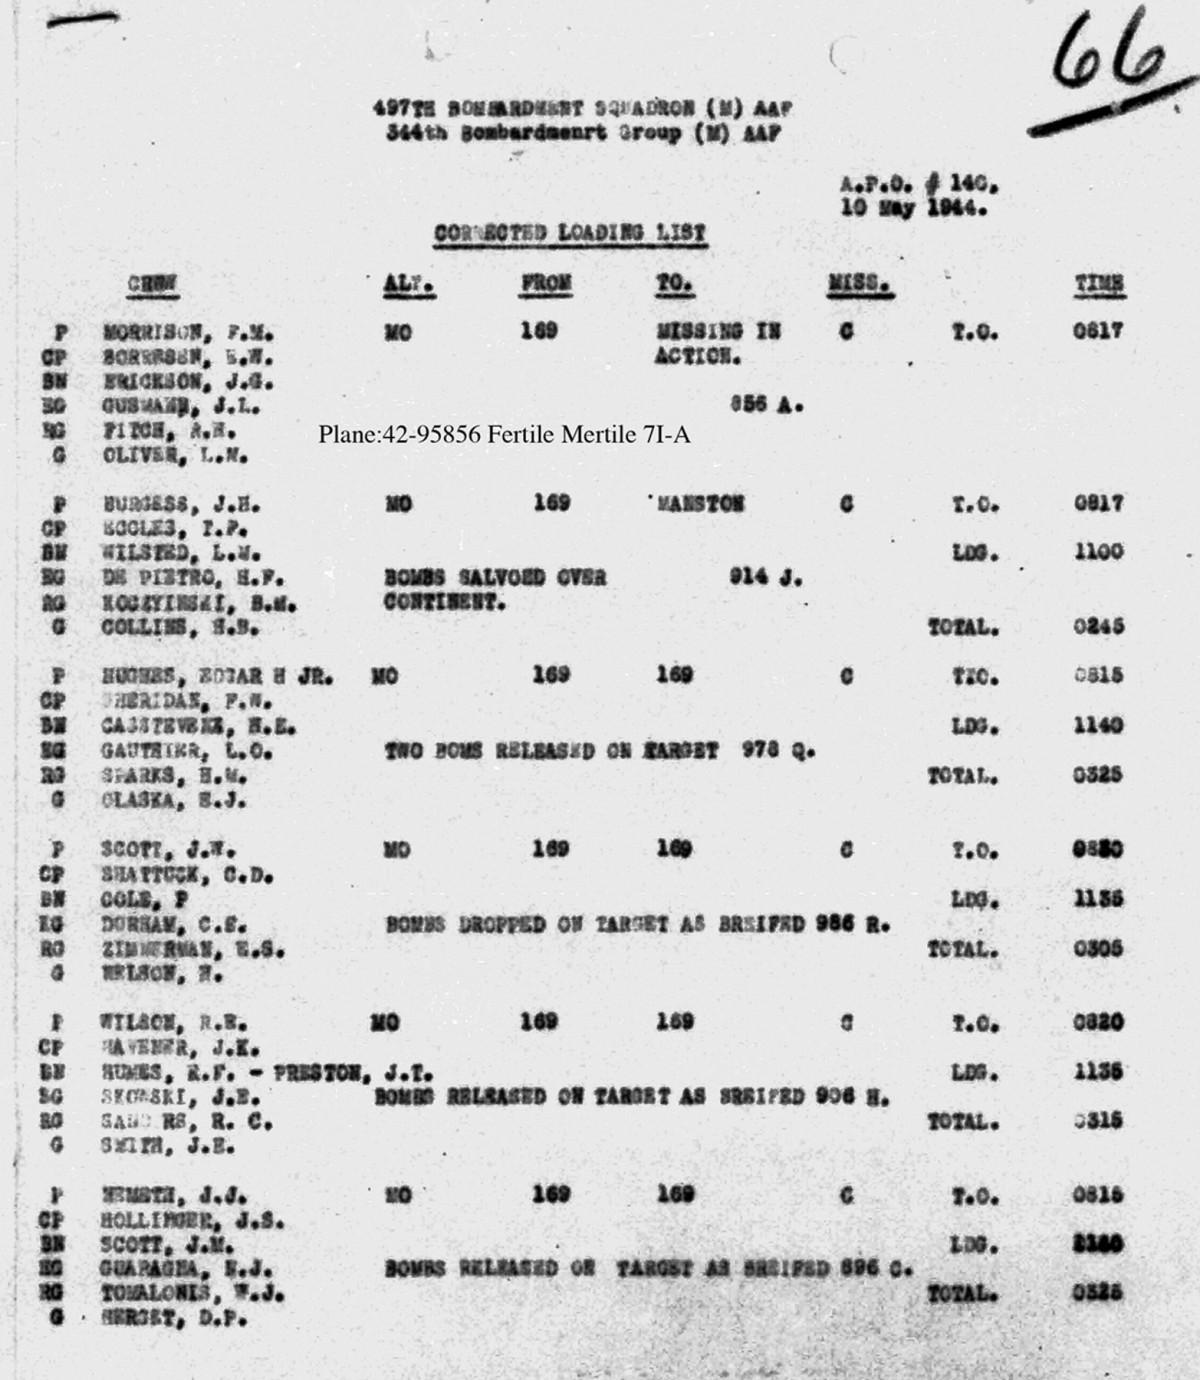 B0289 p487 LL Morrison Borresen 5-10-44 for MACR